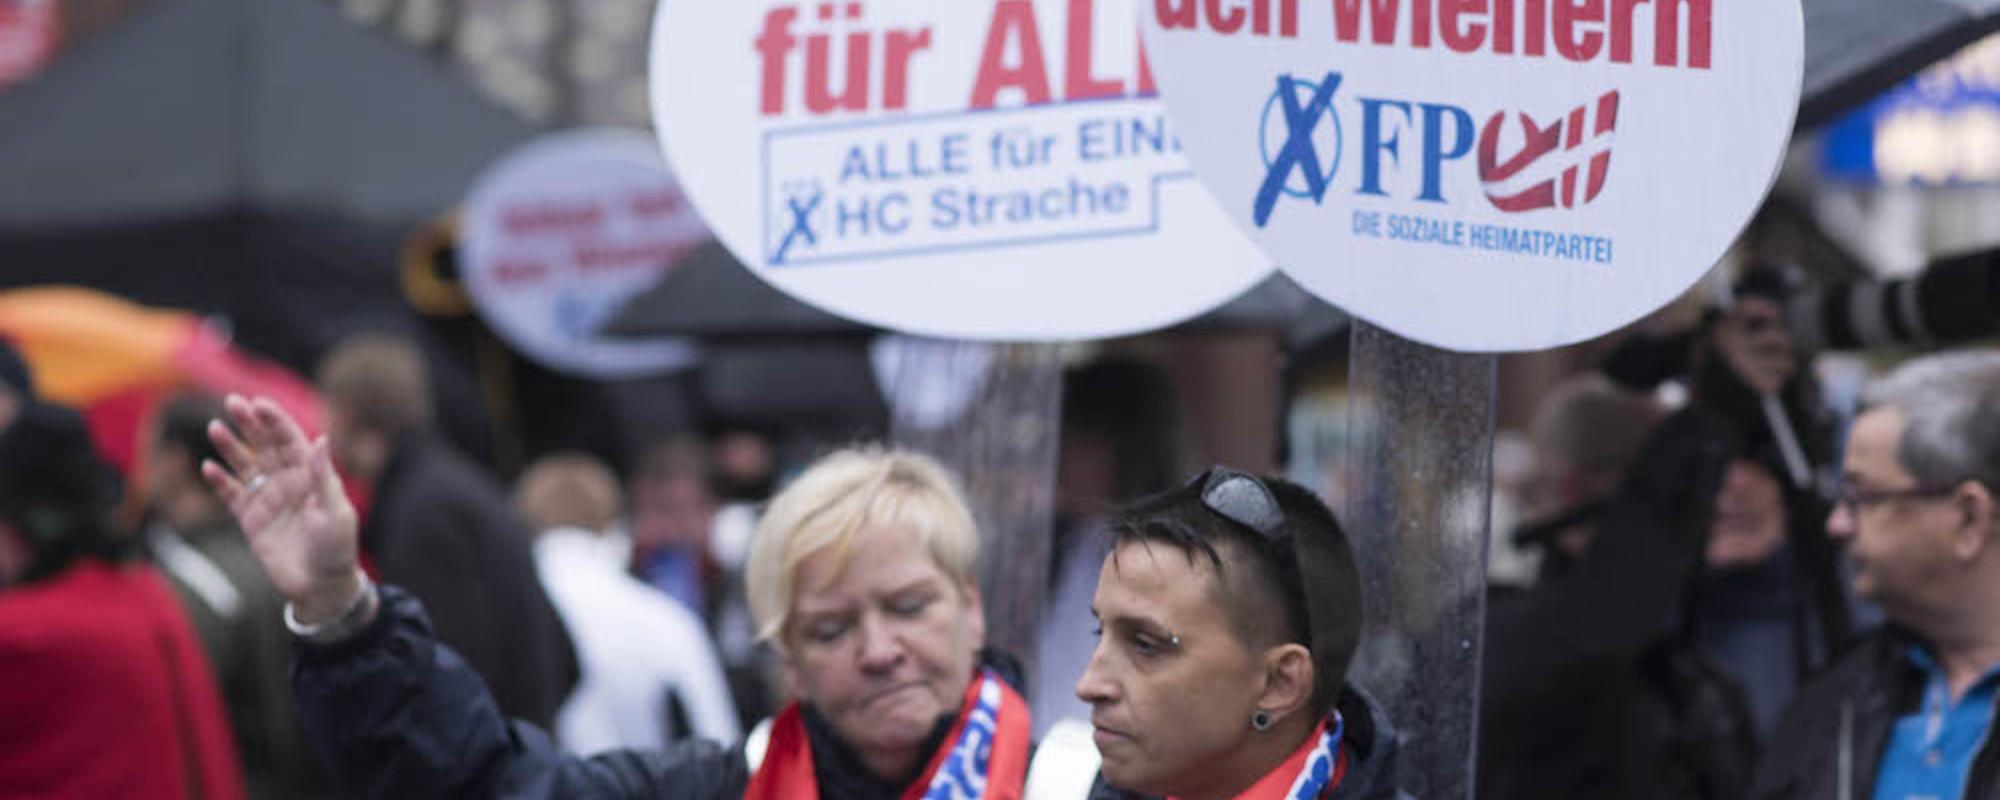 Fotos vom Wahlkampffinale der FPÖ